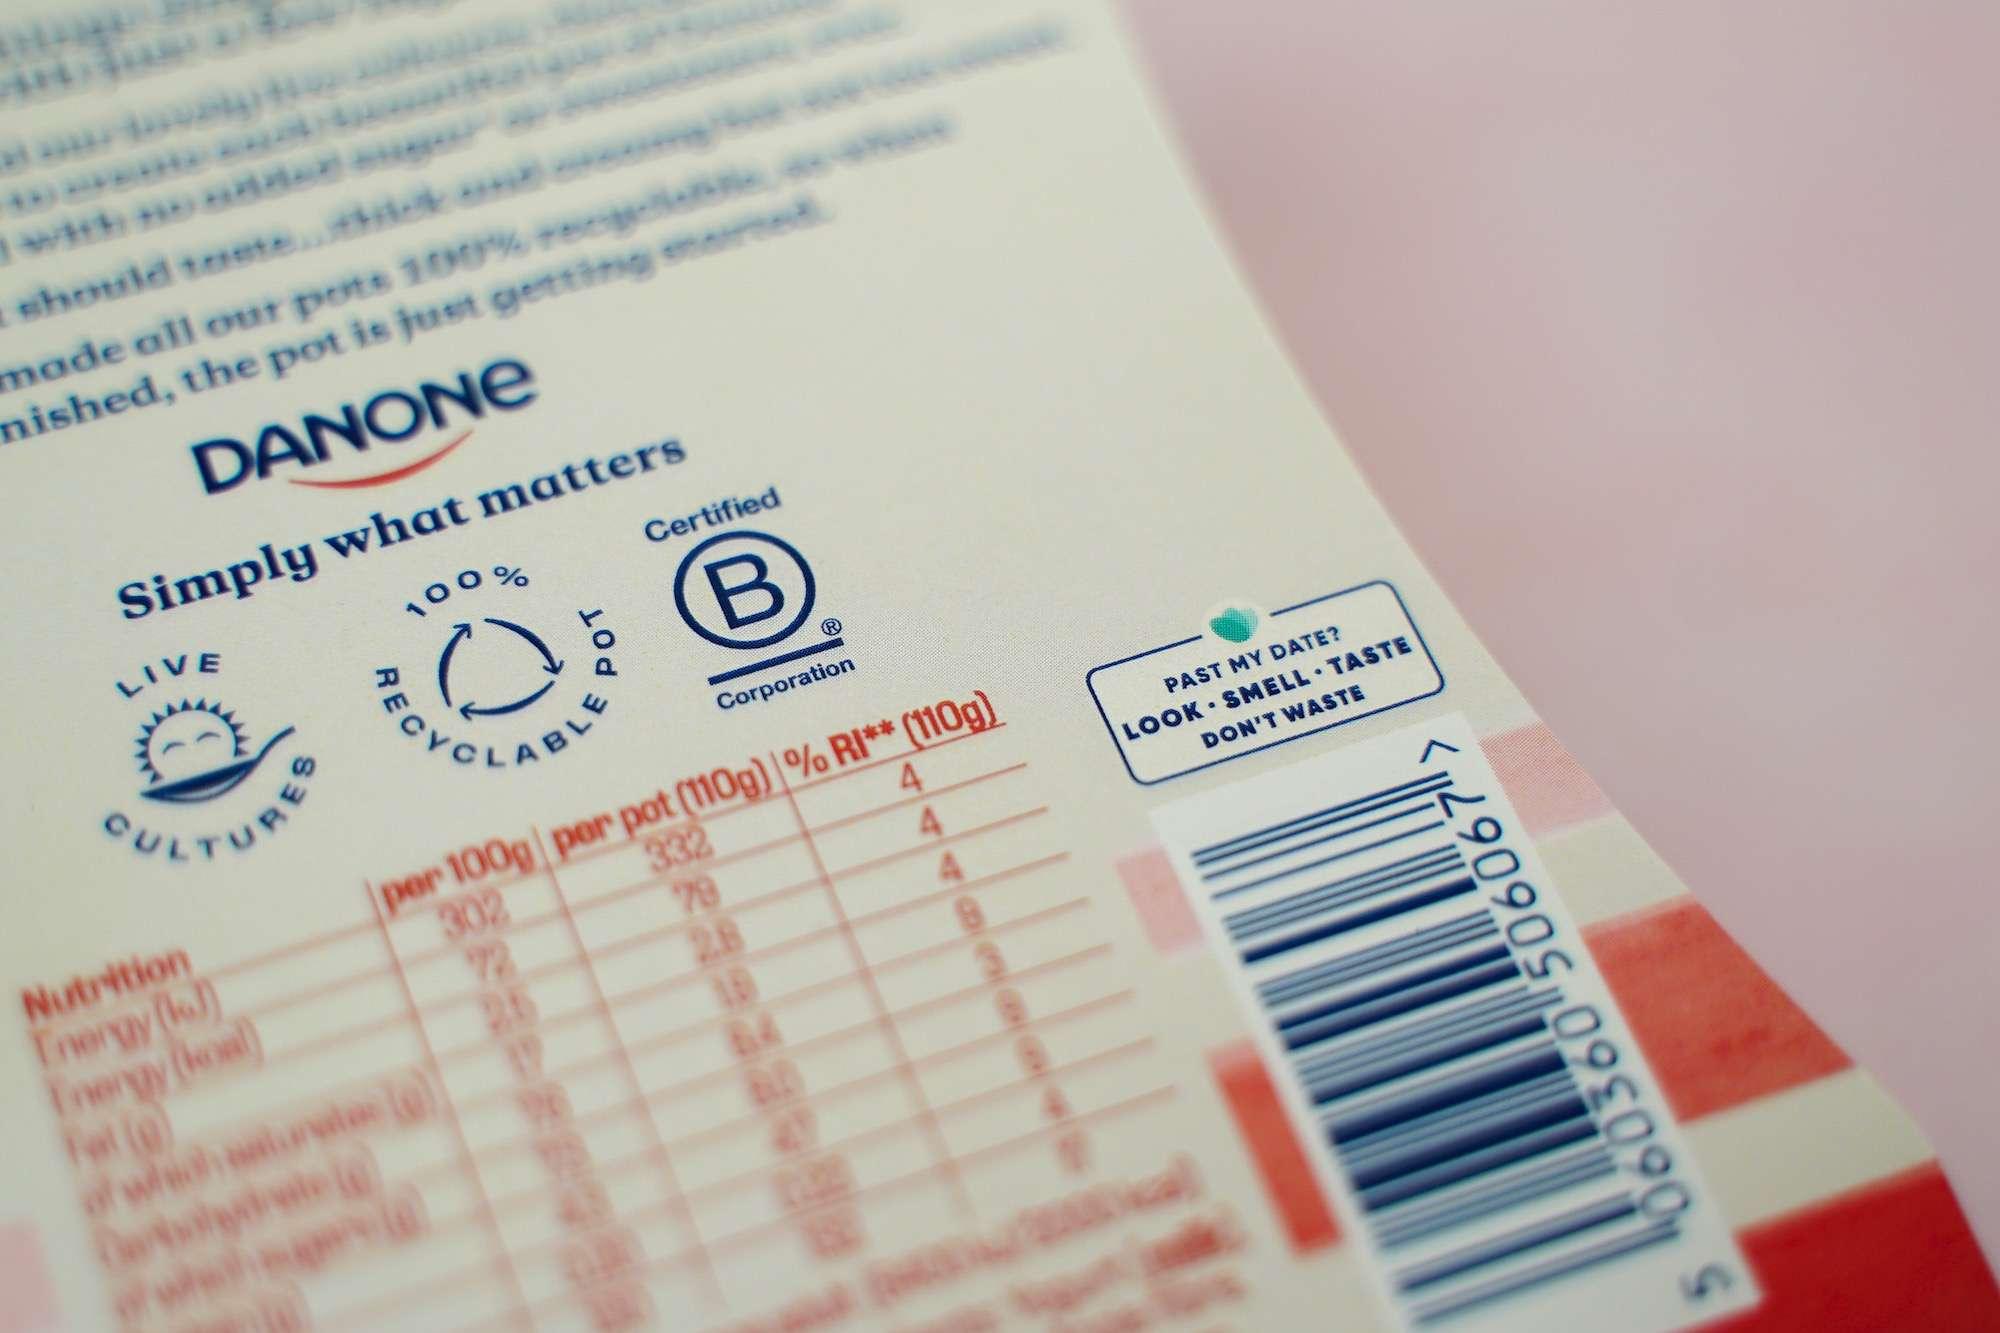 Danone yogurt label